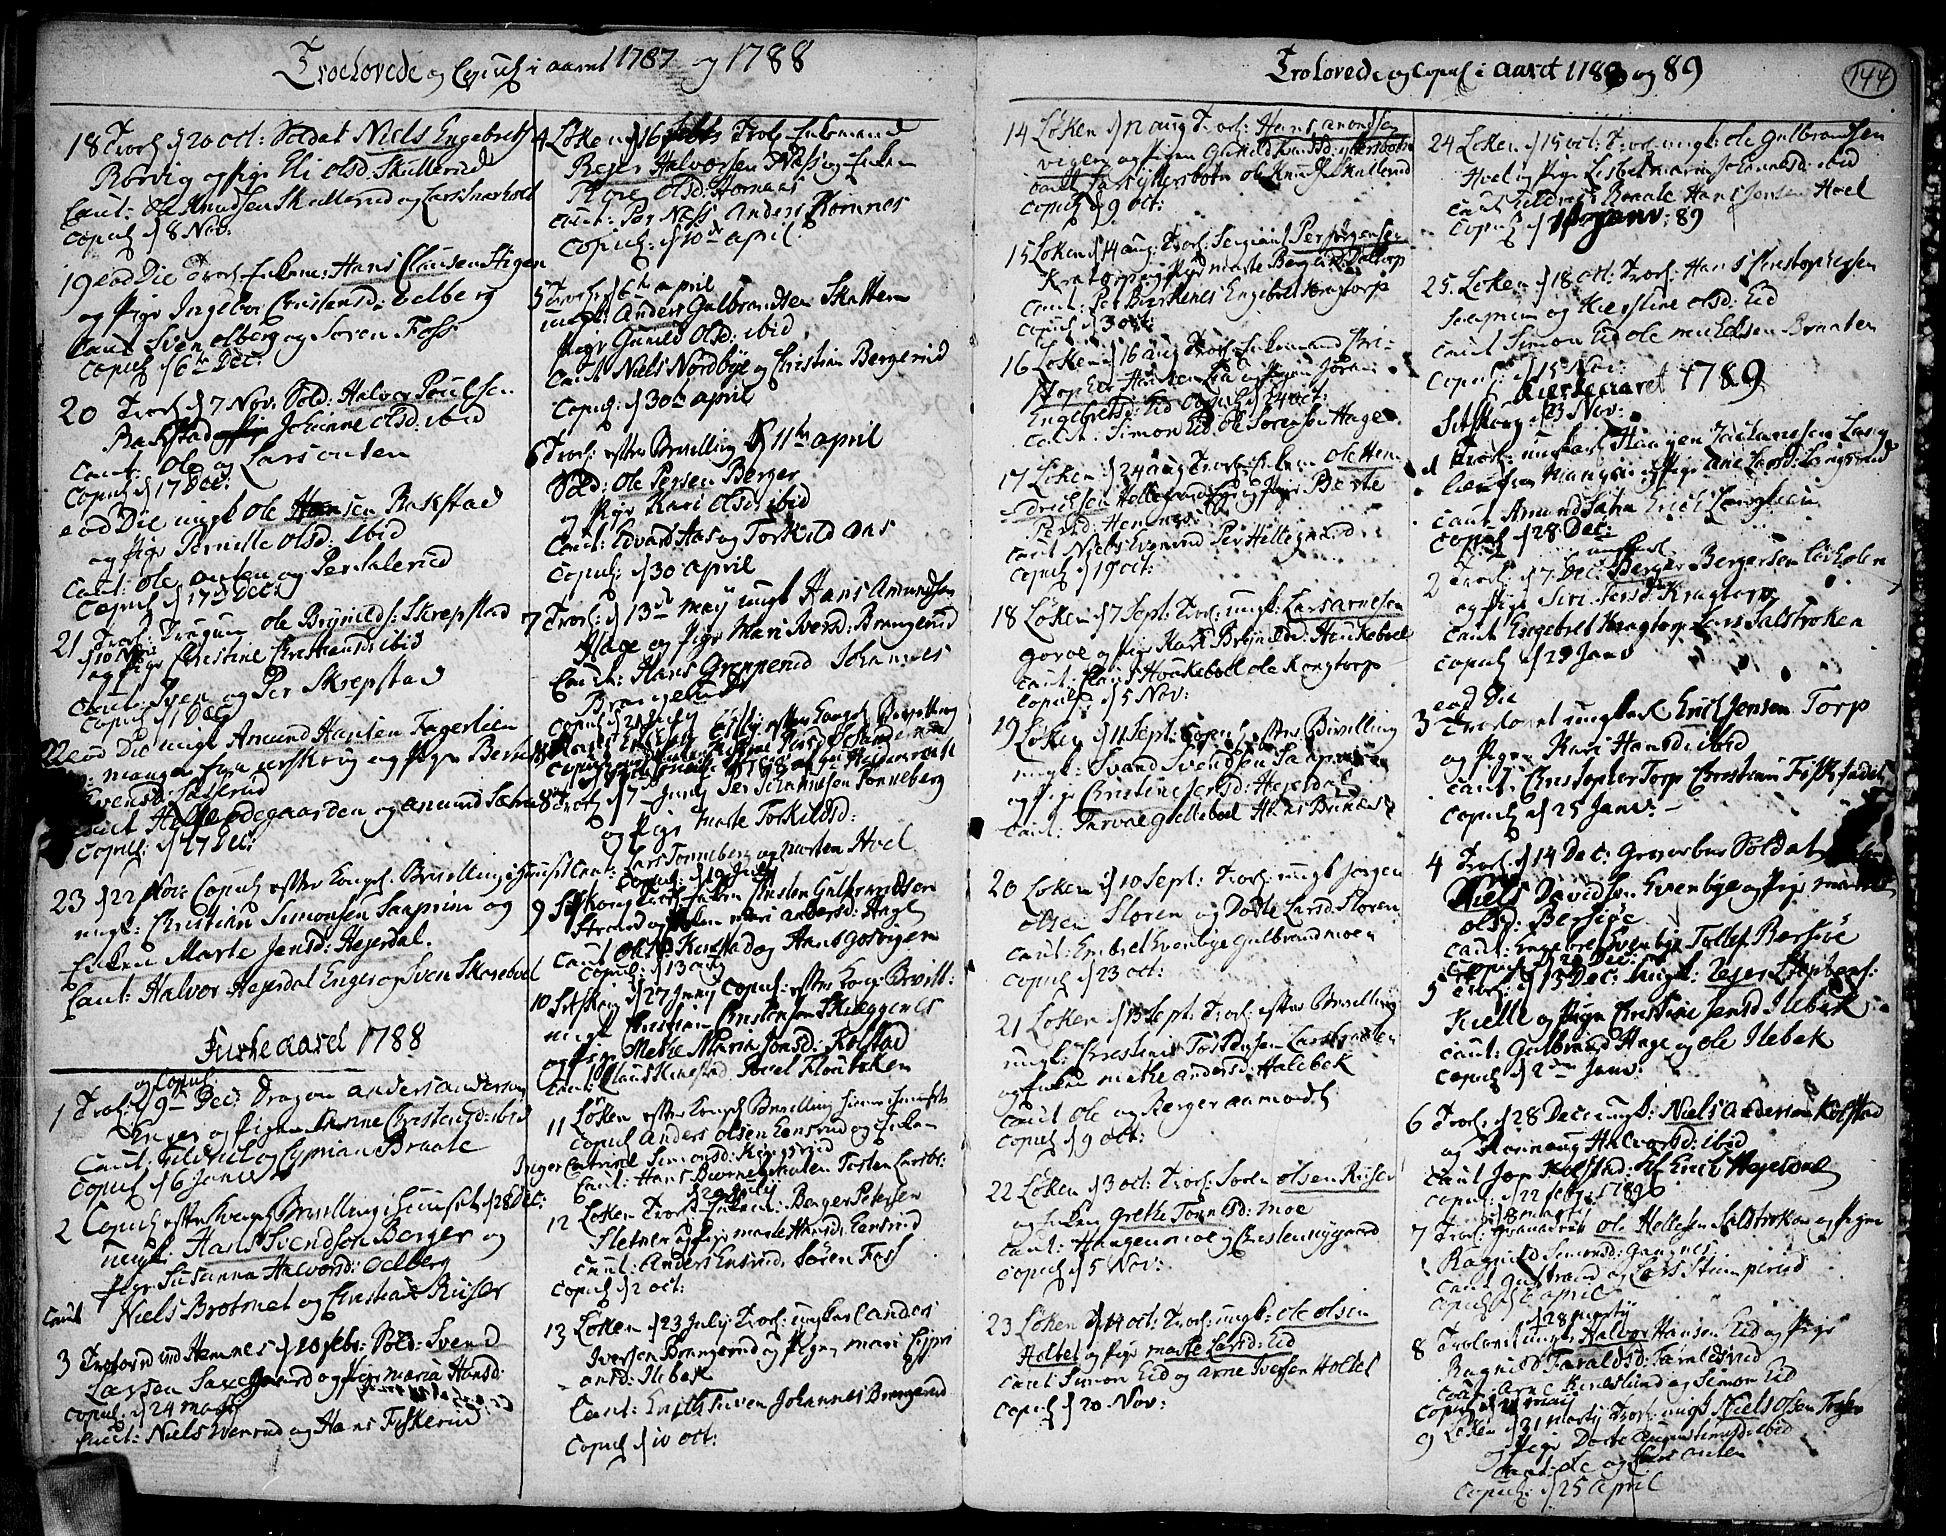 SAO, Høland prestekontor Kirkebøker, F/Fa/L0005: Ministerialbok nr. I 5, 1780-1793, s. 144